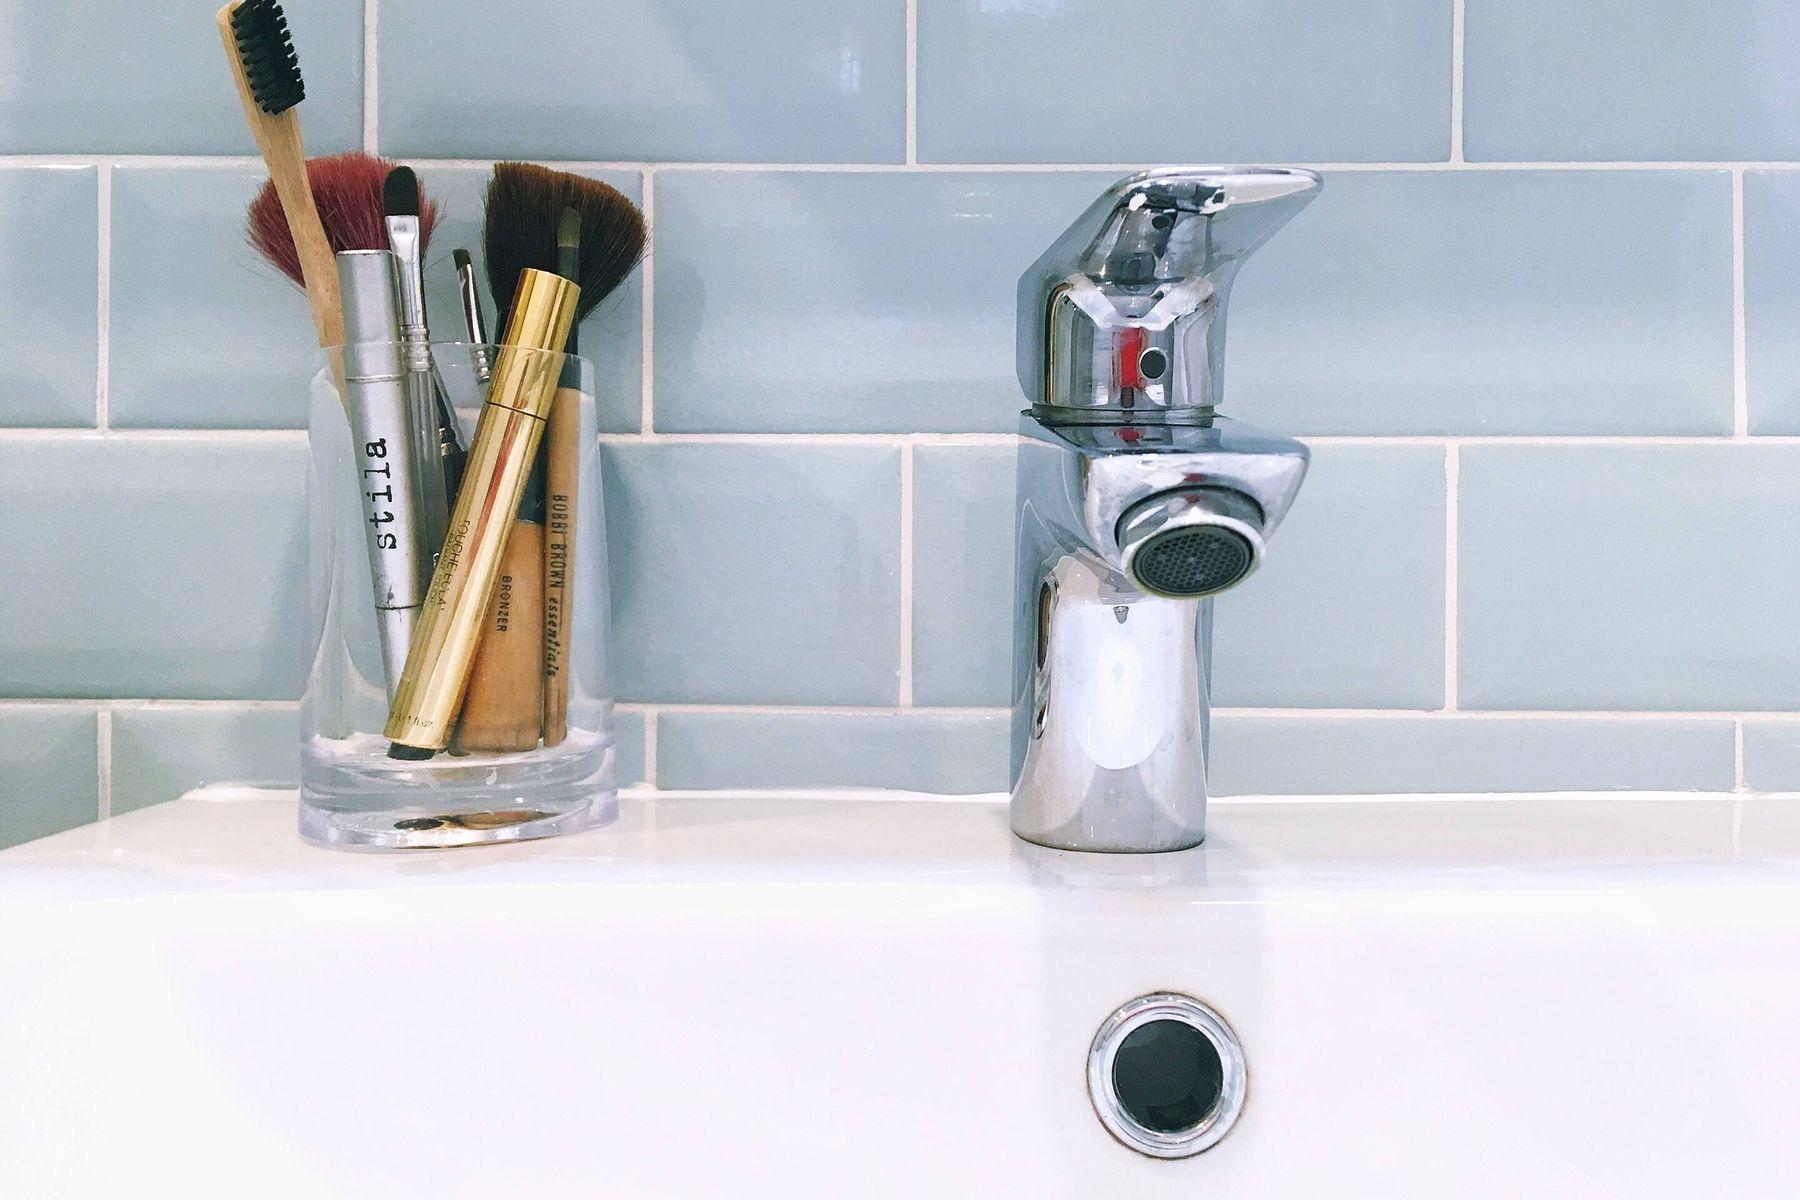 Banyo Lavabosu ve Makyaj Malzemeleri